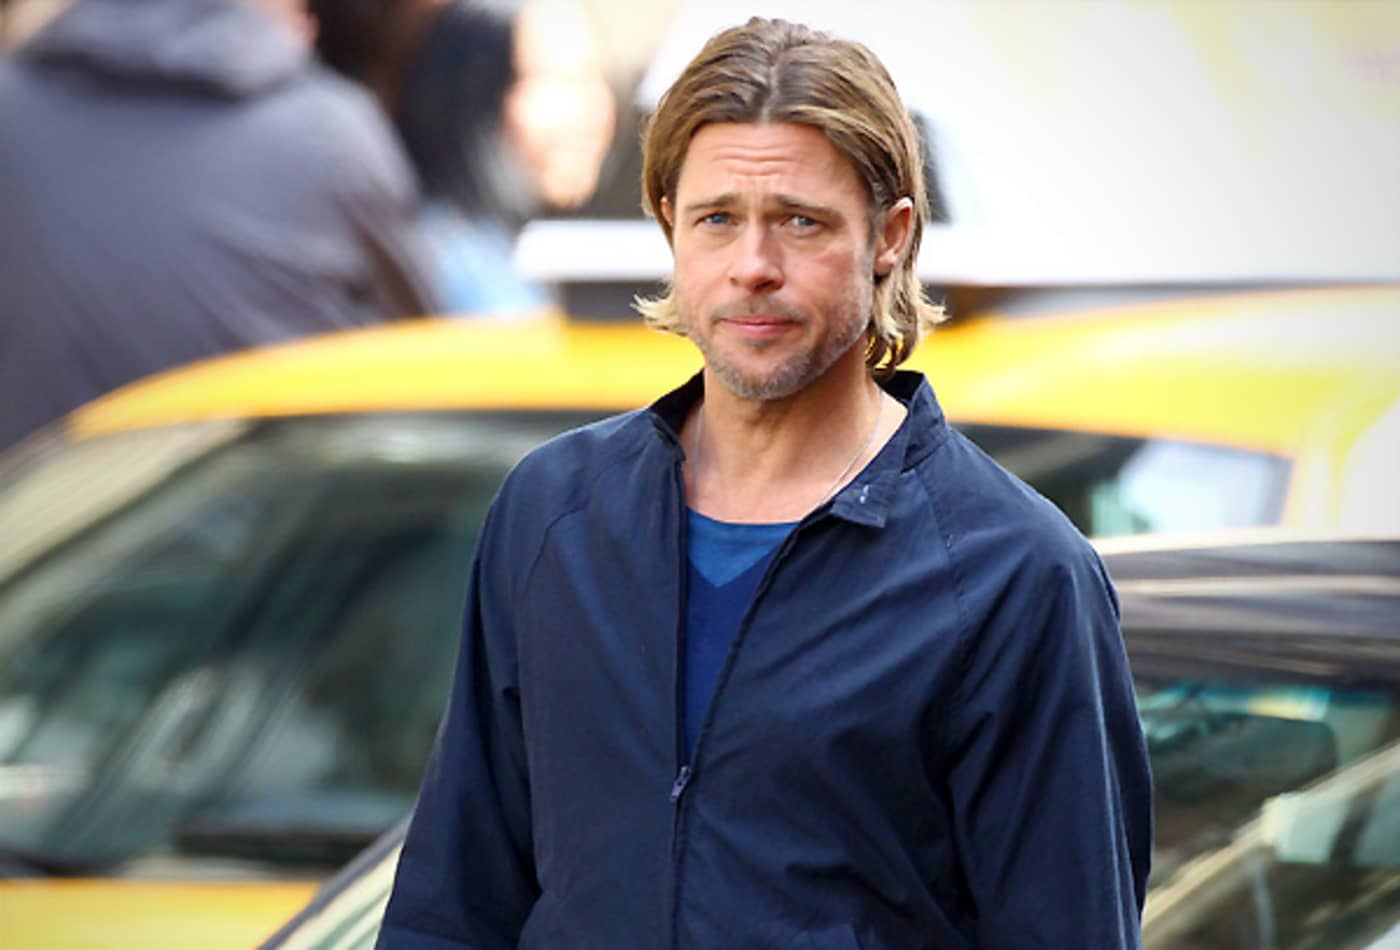 SS_Celebrity_Extravagances_Brad_Pitt.jpg